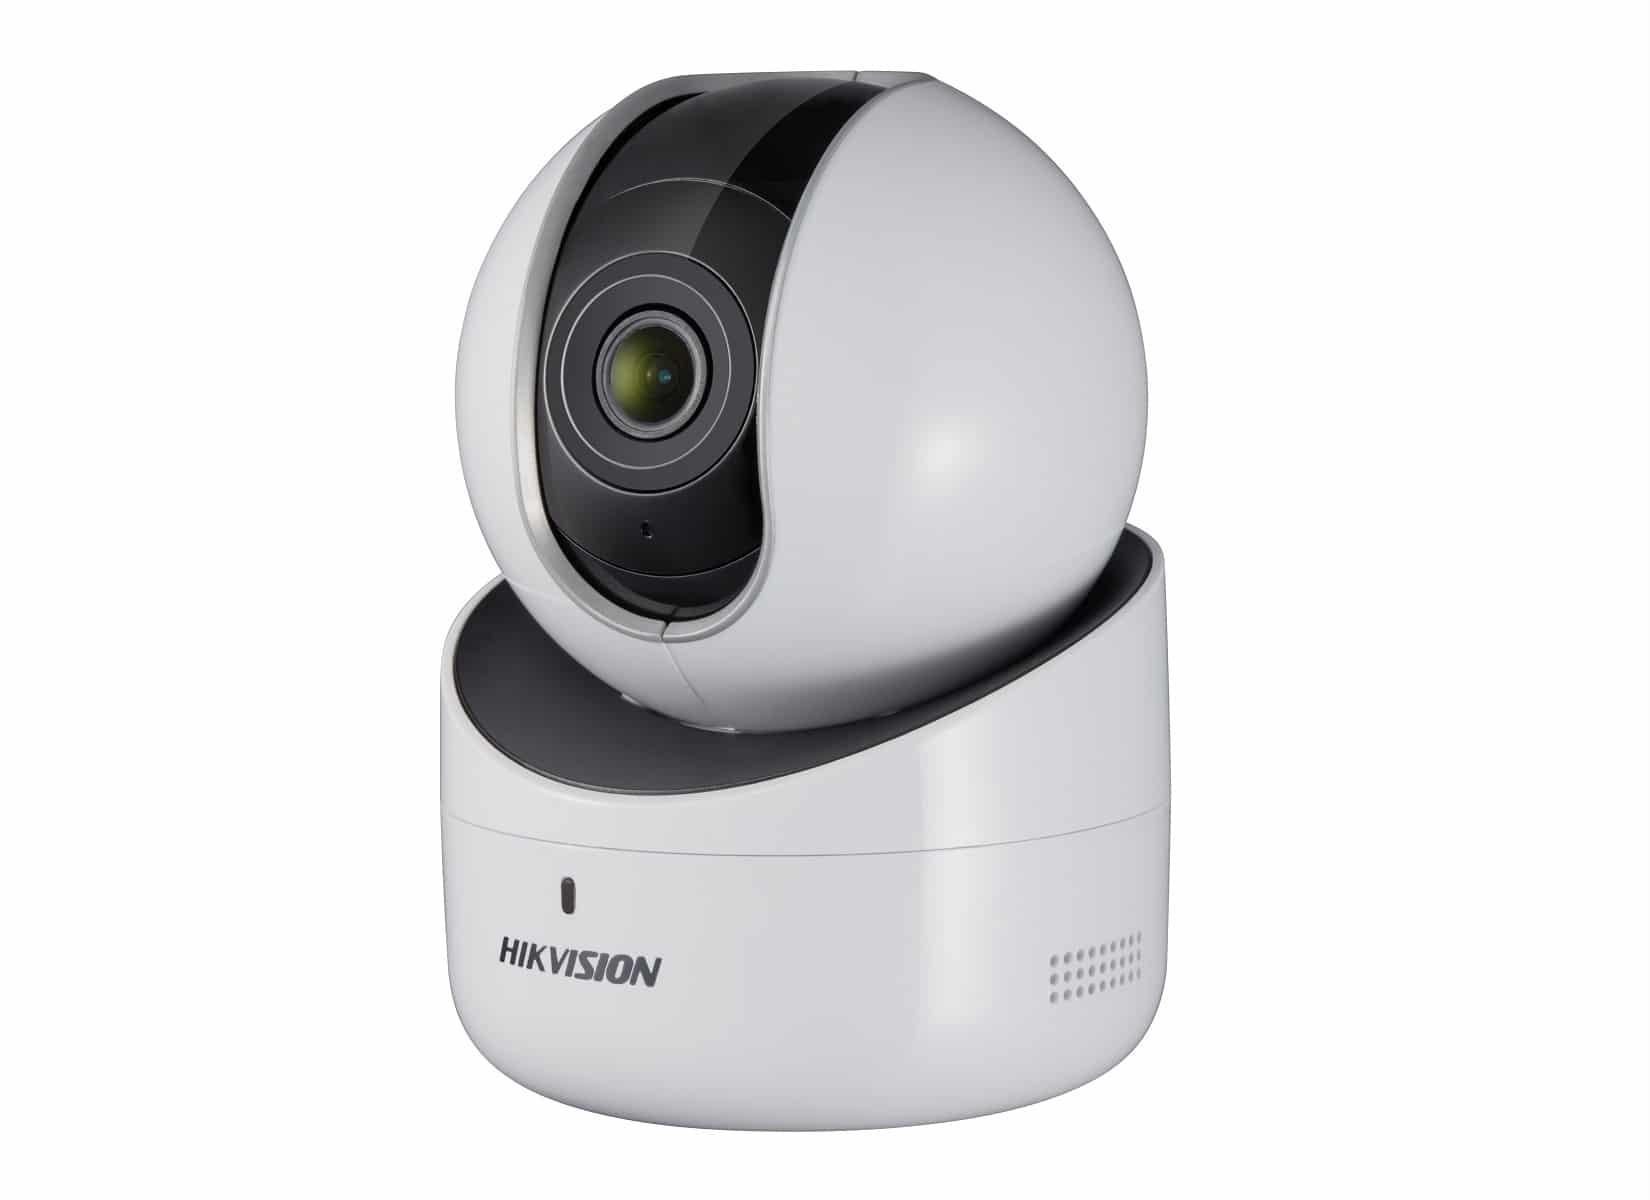 DS-2CV2Q01FD-IW Hikvision Smart Network WiFi Mini PT